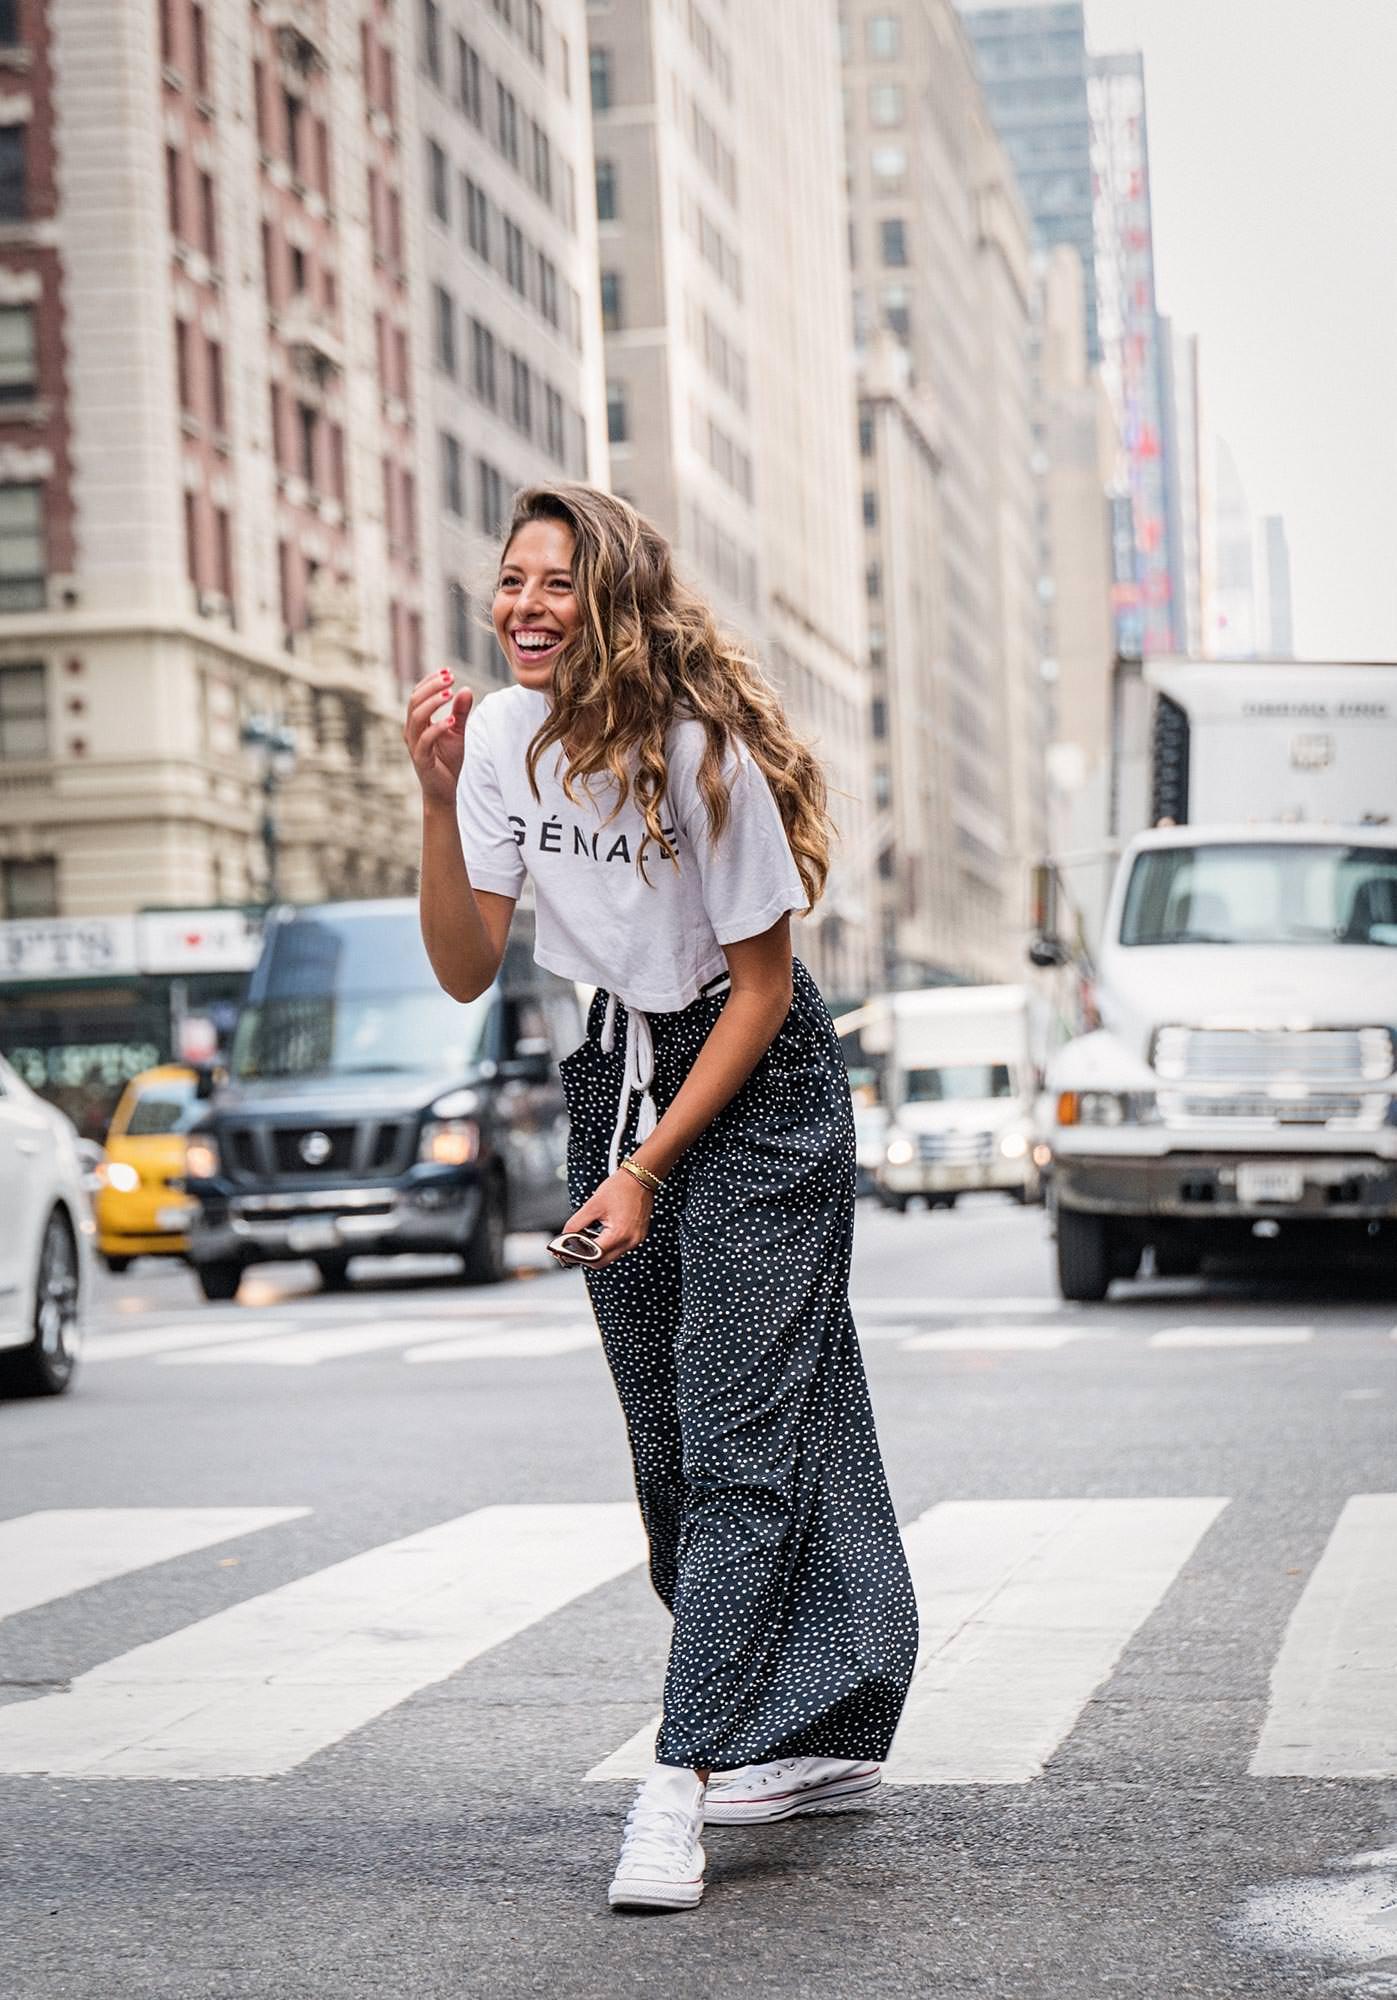 SYOSS-Trendwatch-NYC-018.jpg